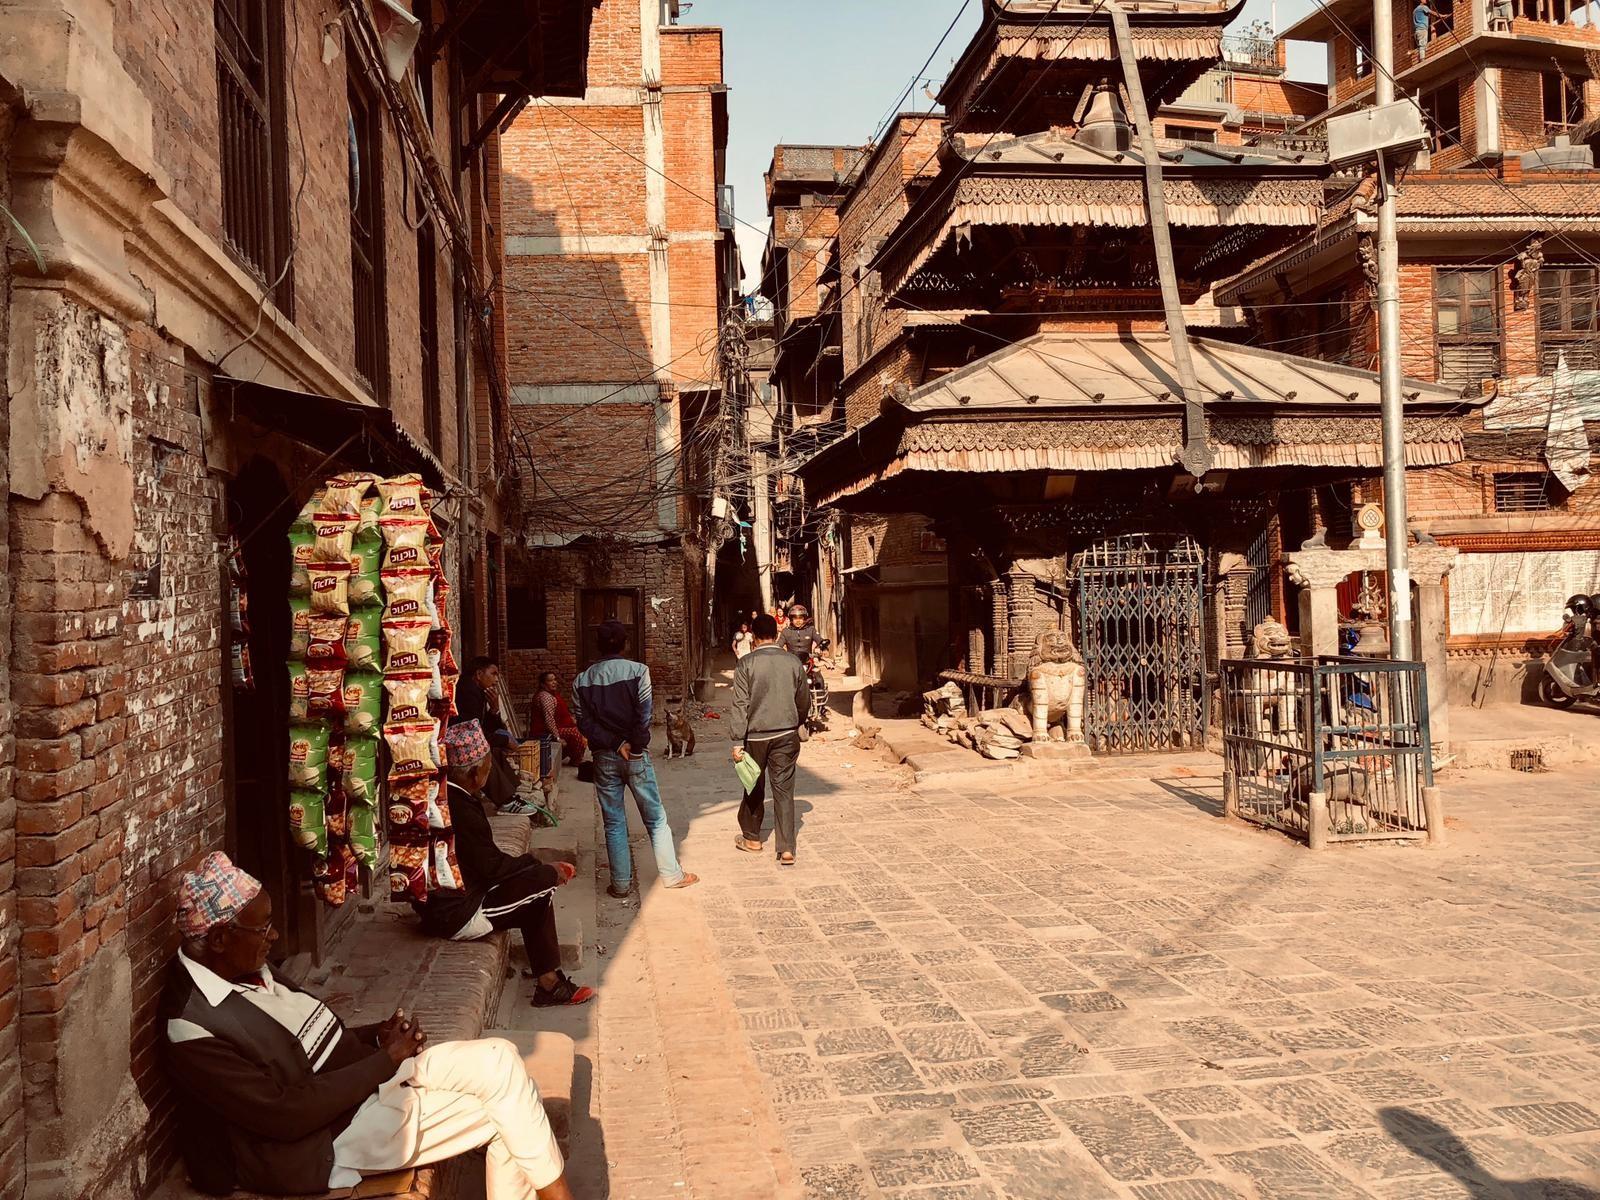 viaggio-in-nepal-7d2f9b218df2f087321ce0d